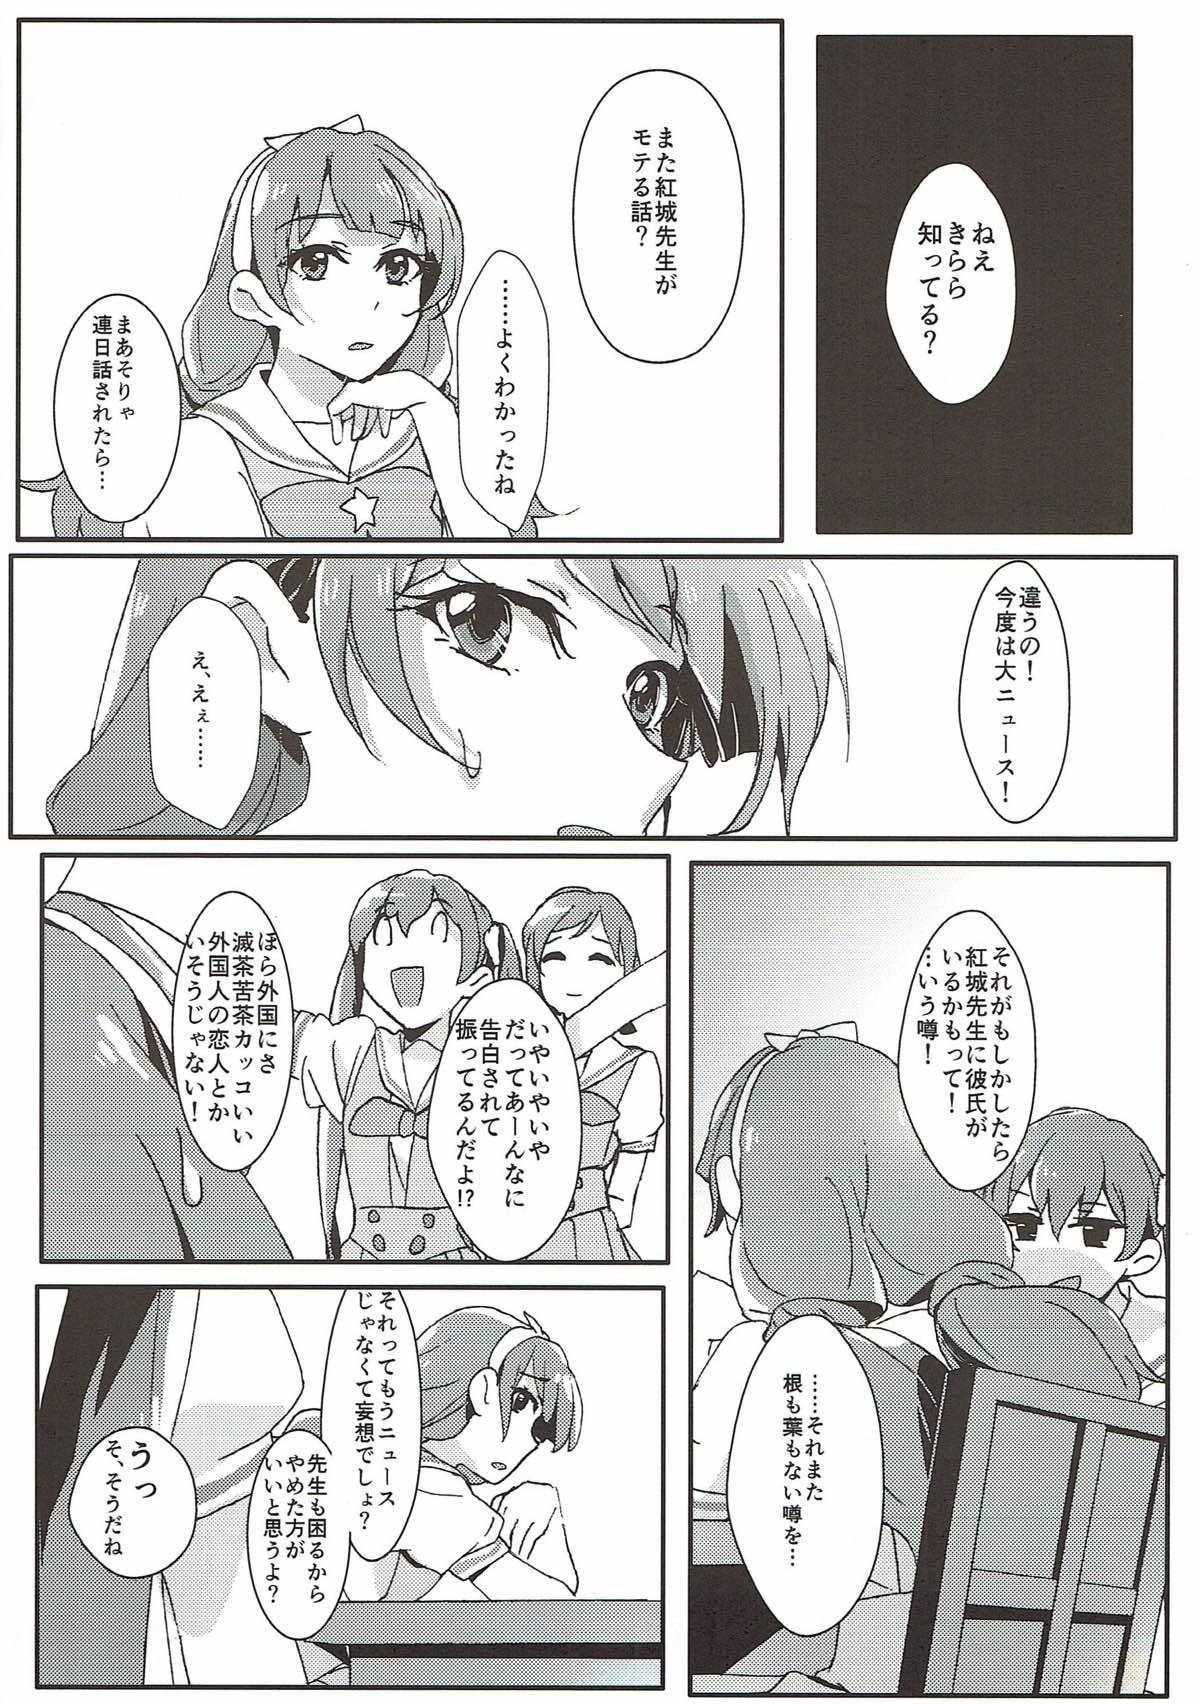 Sensei to Atashi 22